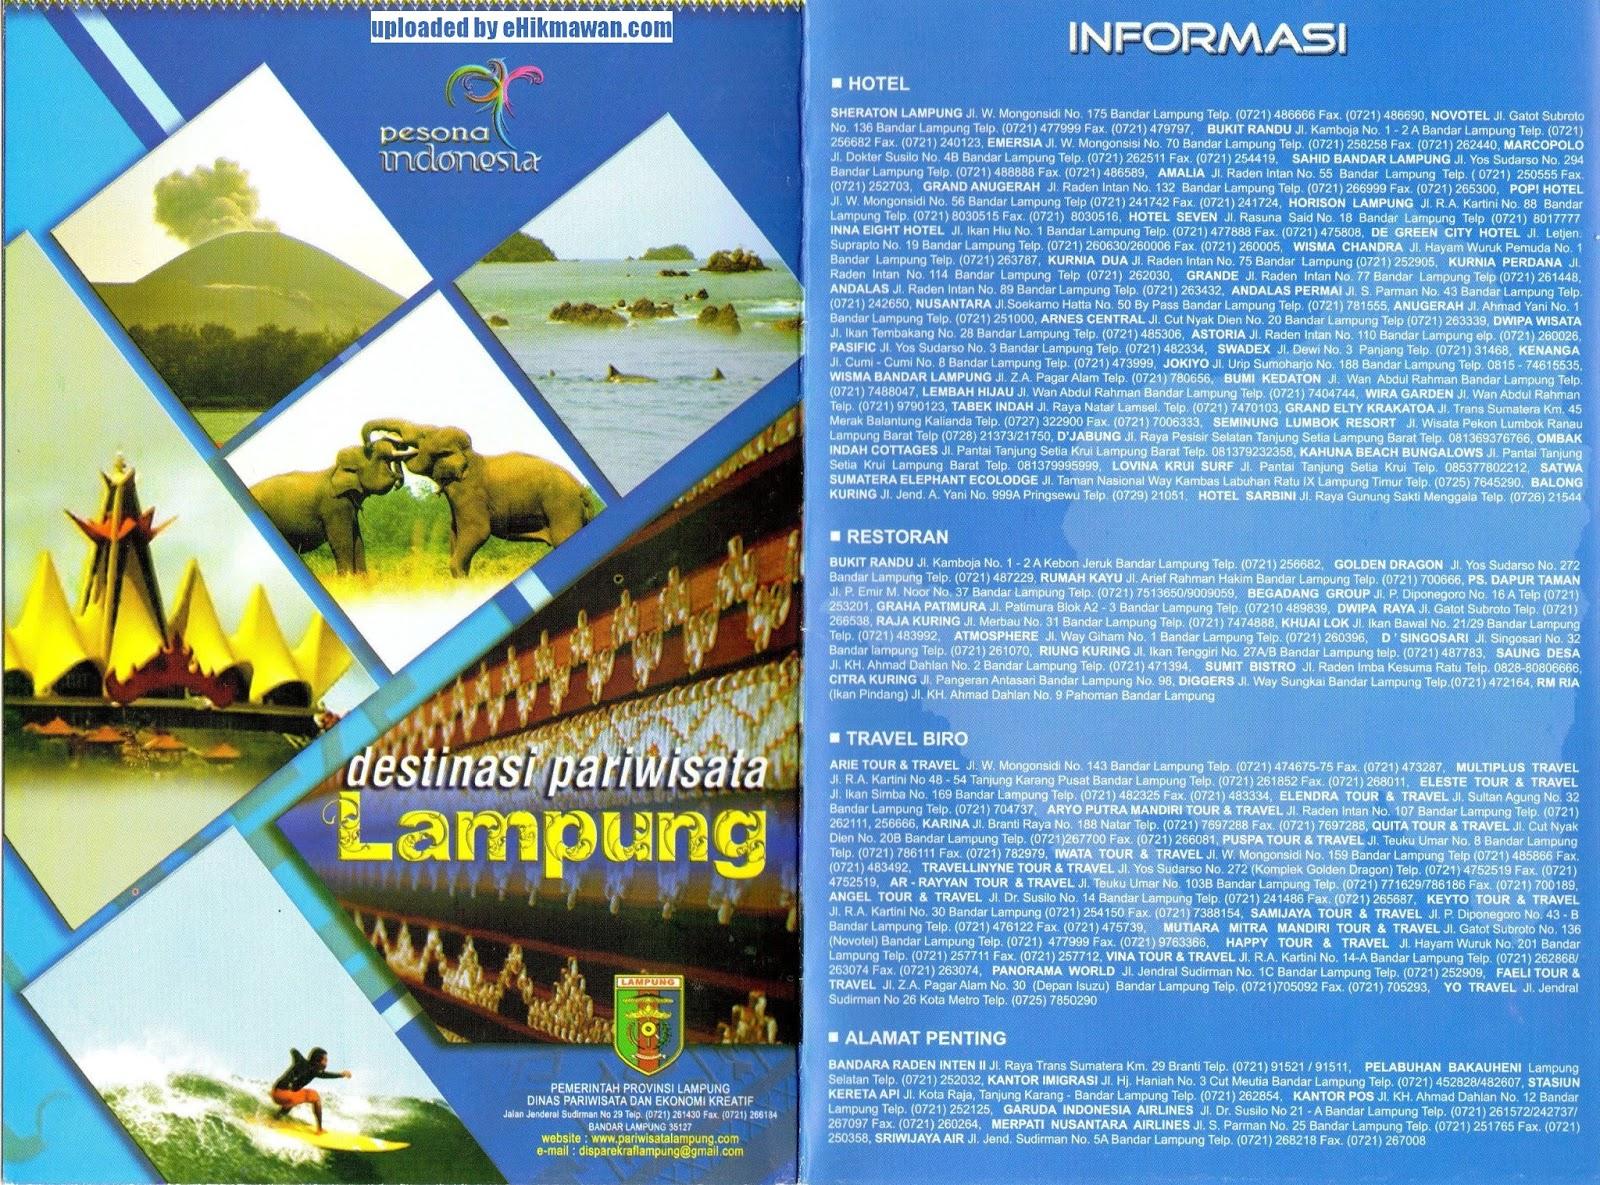 Brosur Peta Destinasi Pariwisata Lampung Brosur Peta Destinasi